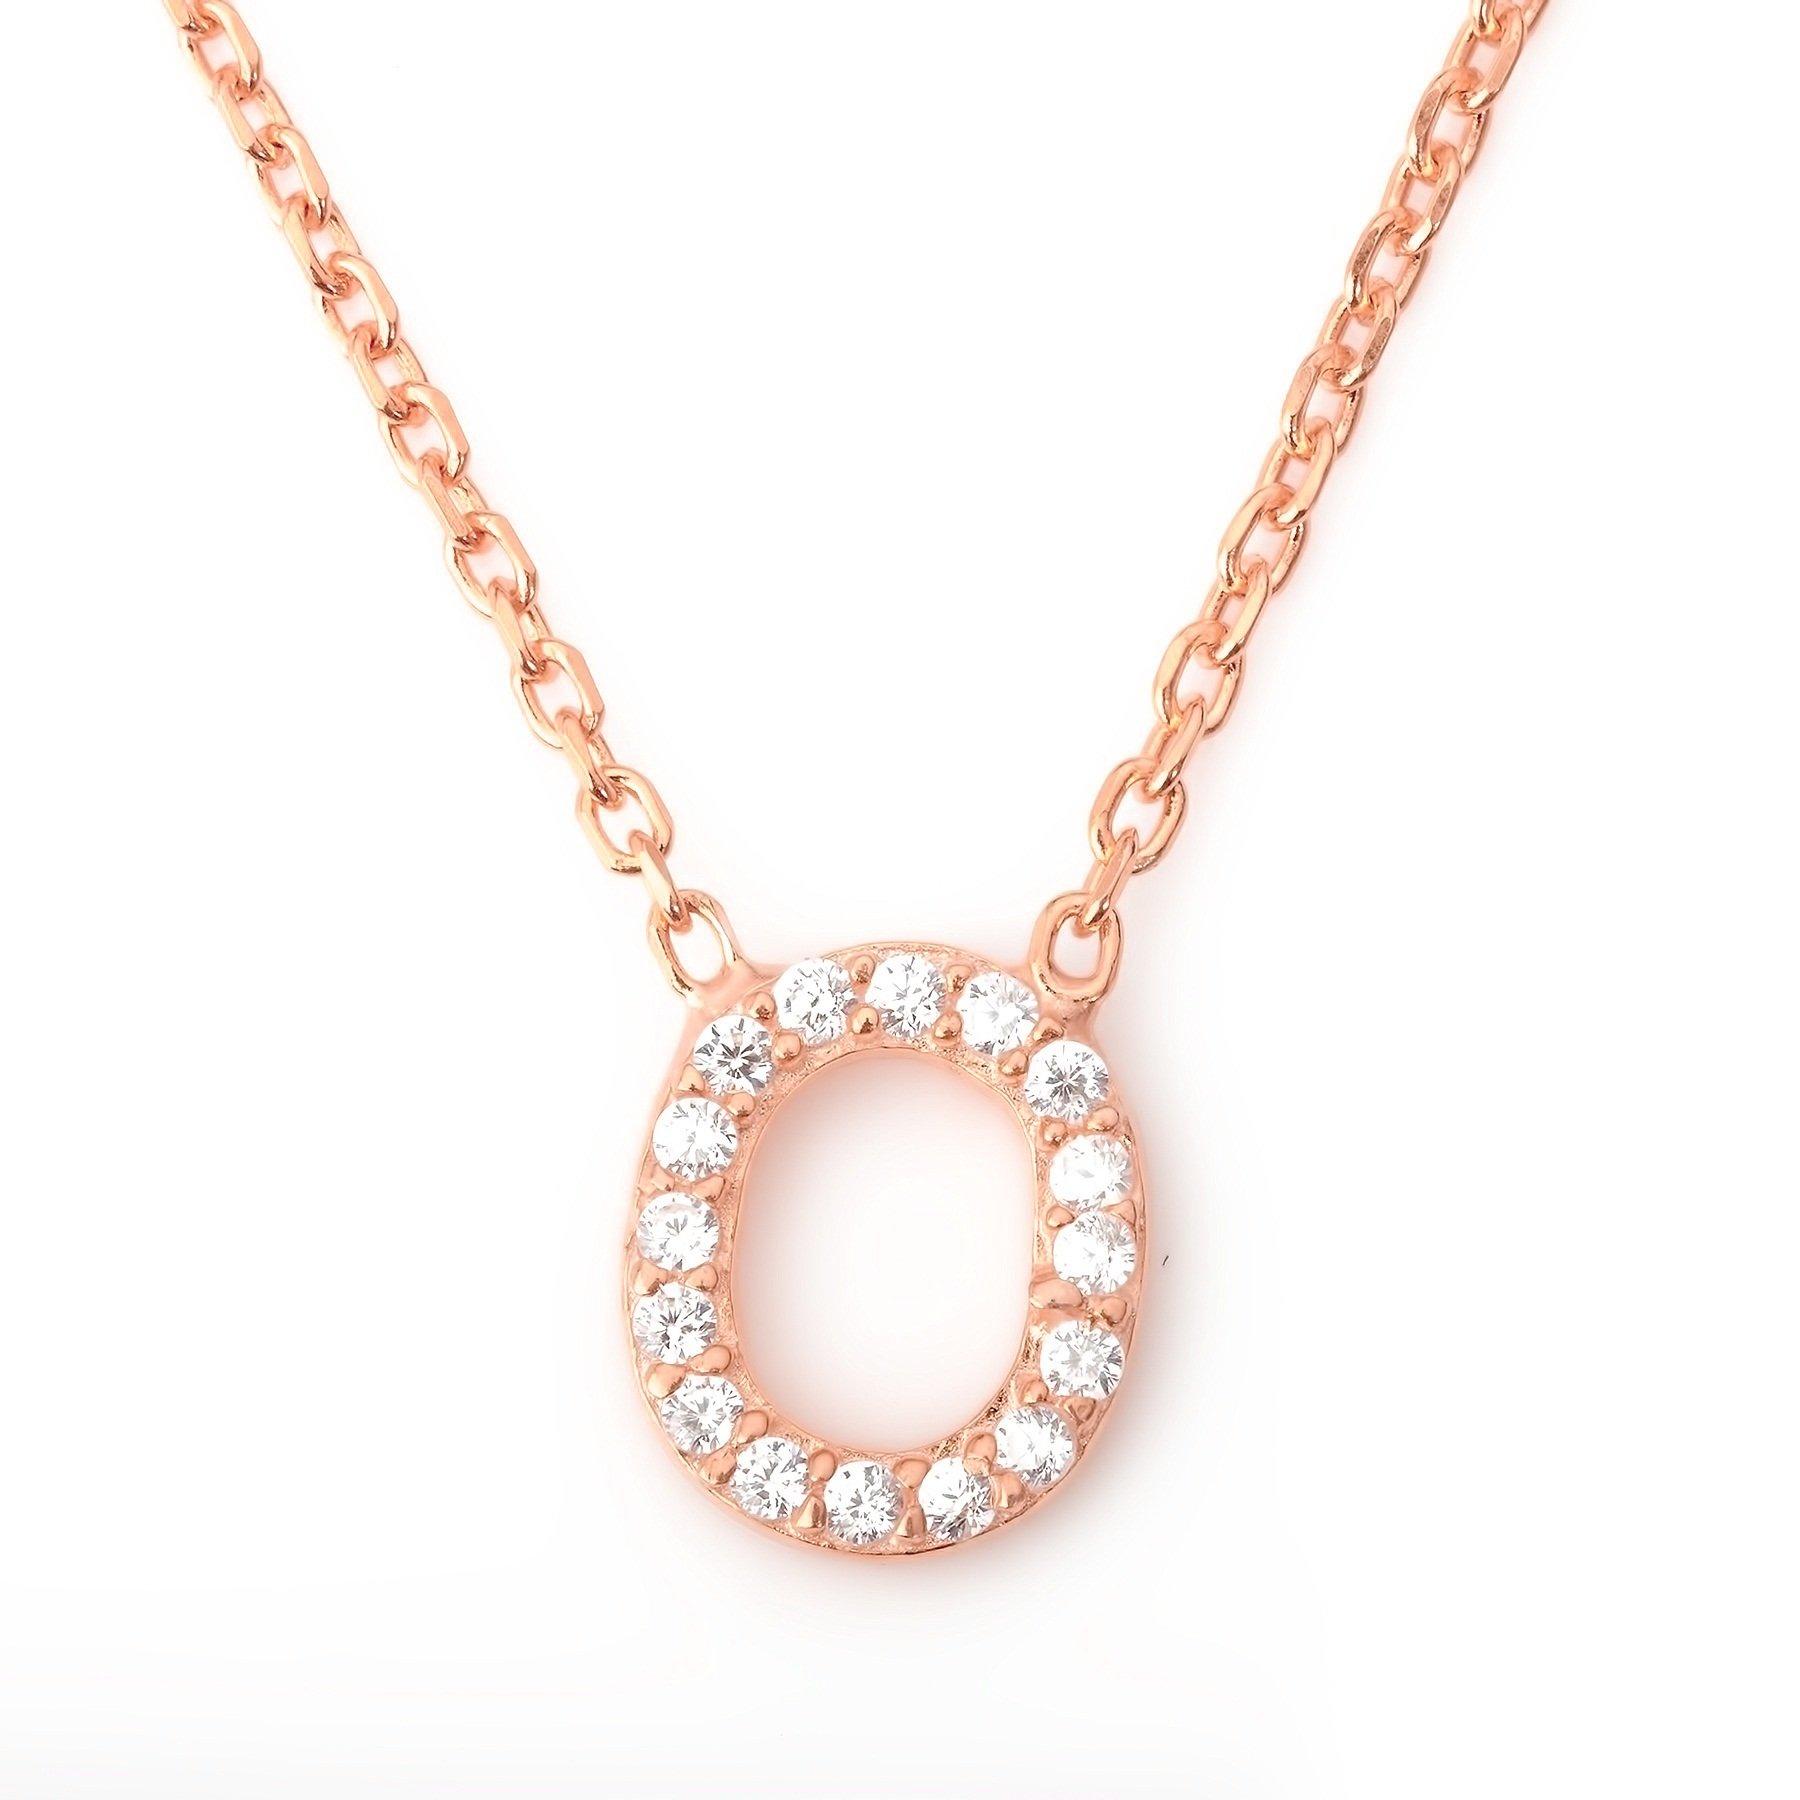 Bonyak Jewelry 18 Inch Rhodium Plated Necklace w// 4mm Rose Pink October Birth Month Stone Beads and Saint Lidwina of Schiedam Charm